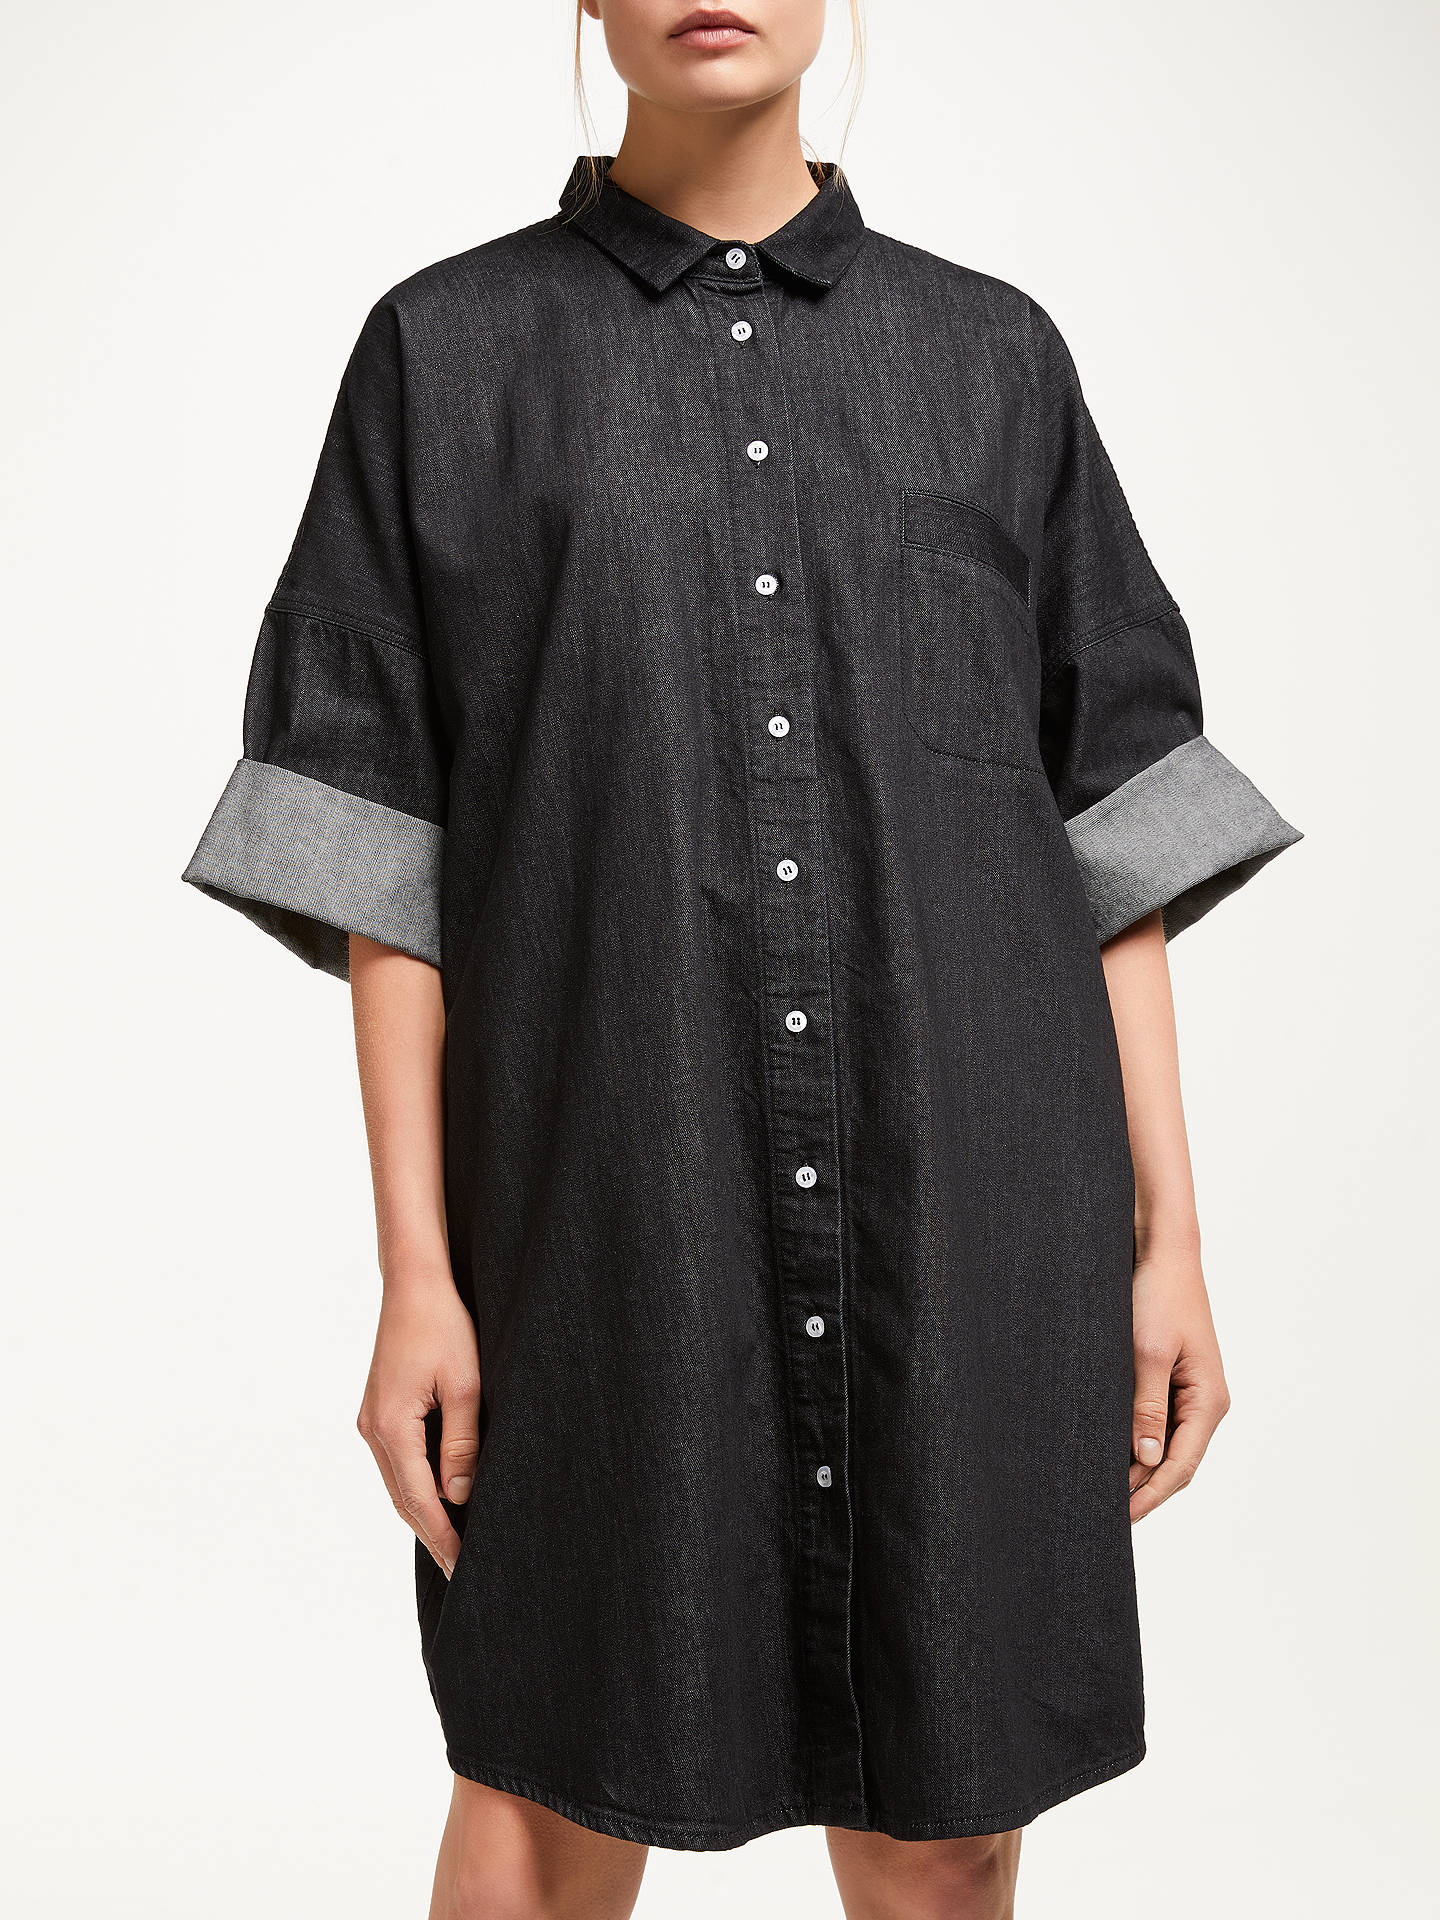 a4b7330339b Buy Kin Denim Oversized Utility Shirt Dress